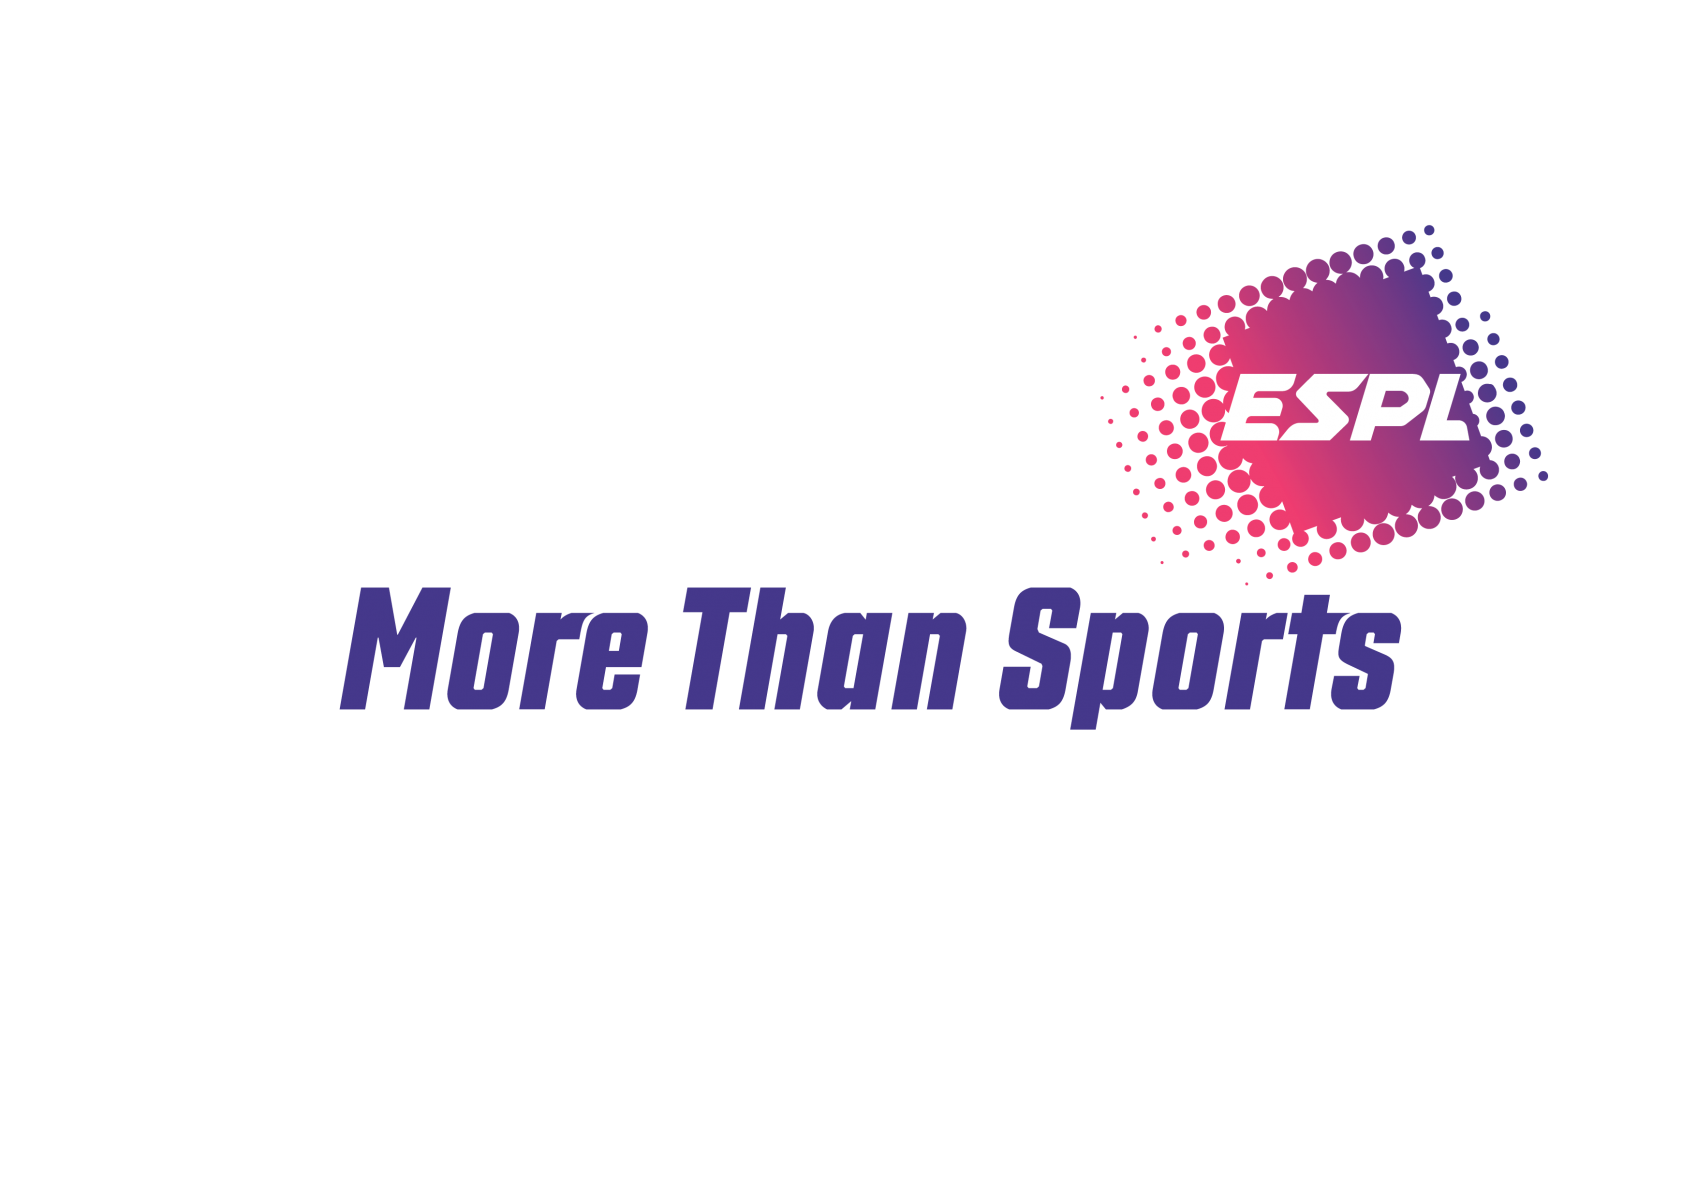 esports pro league tagline